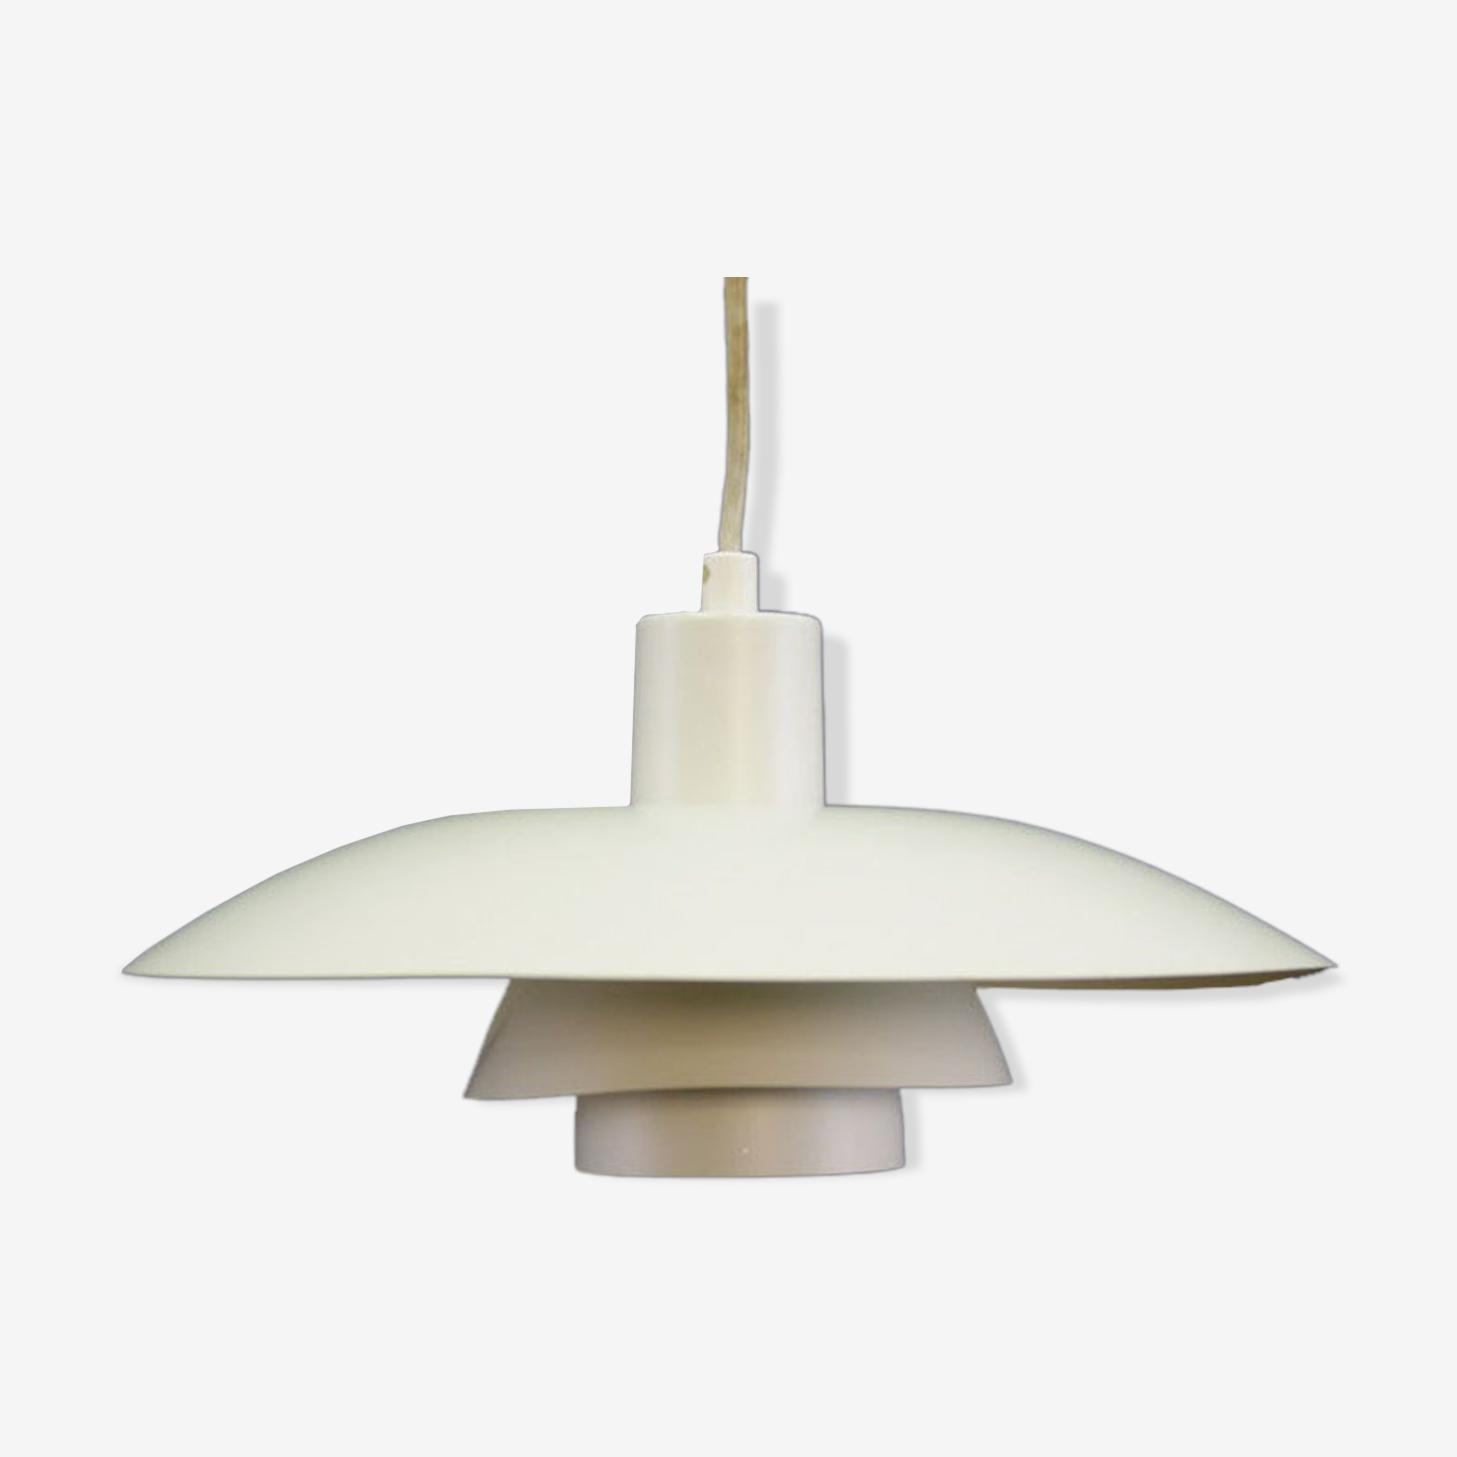 PH4/3 lamp by Poul Henningsen for Louis Poulsen 60/70